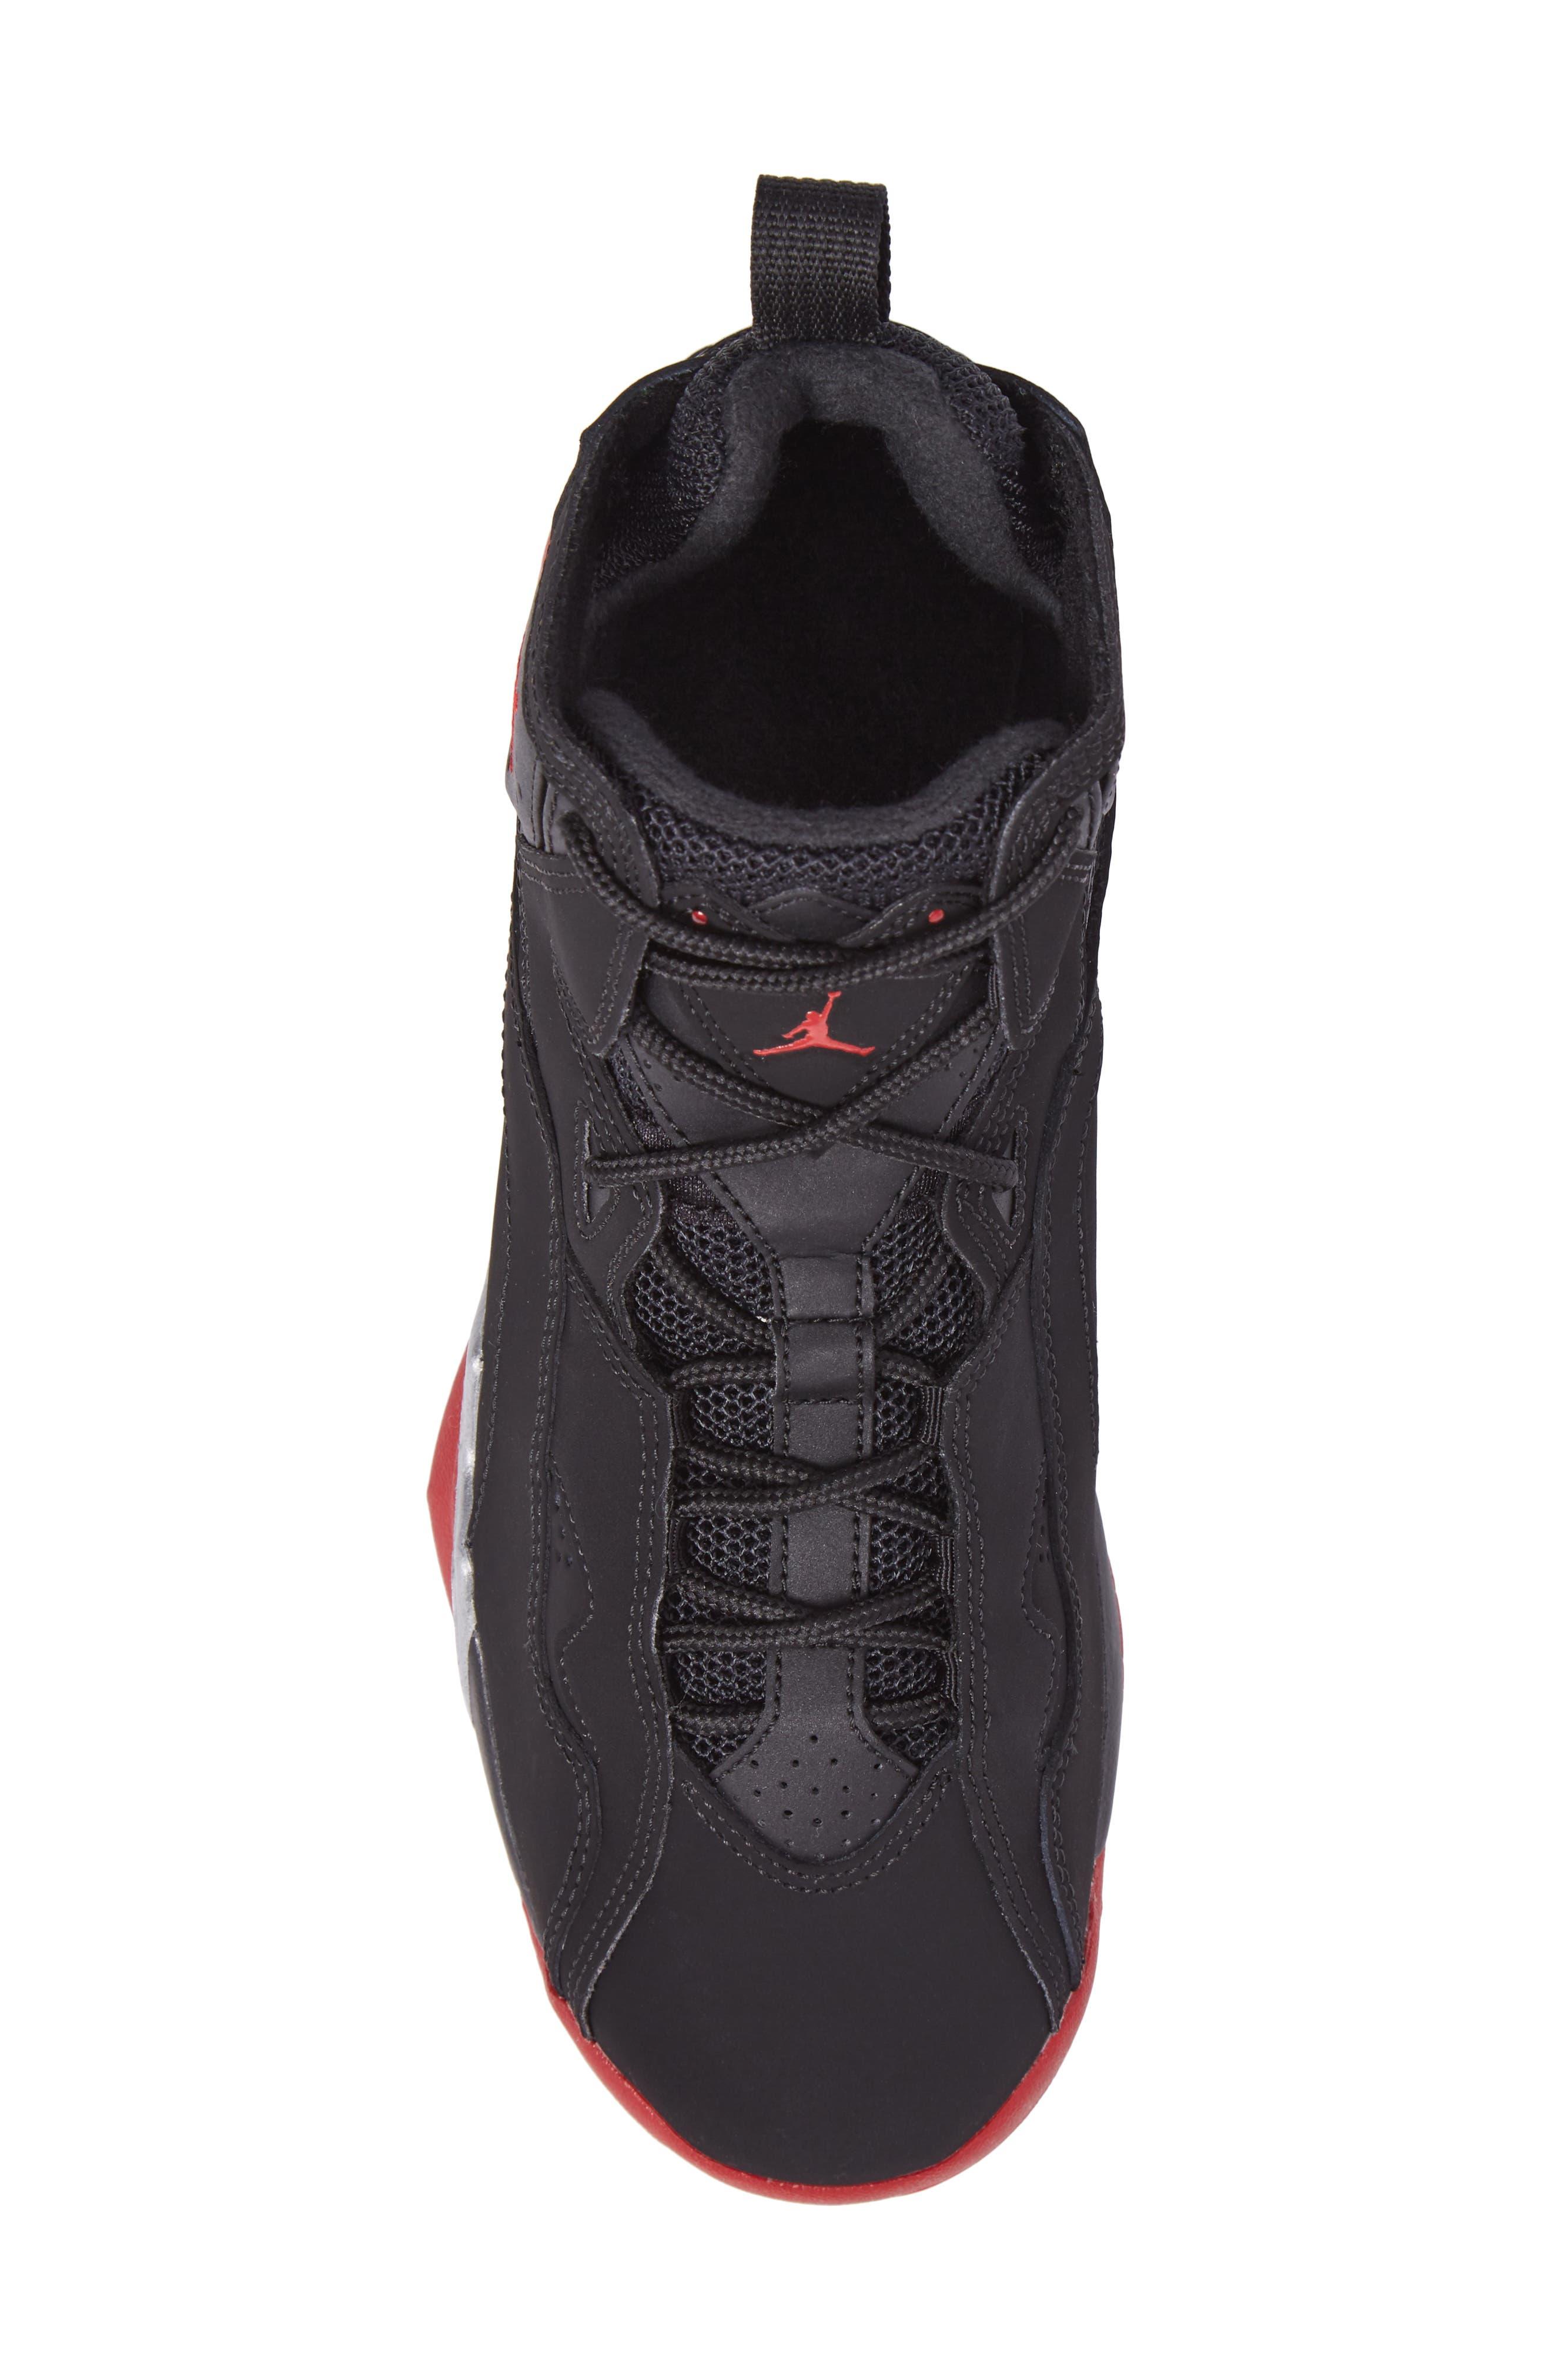 True Flight BG High Top Sneaker,                             Alternate thumbnail 5, color,                             Black/ Gym Red/ Silver